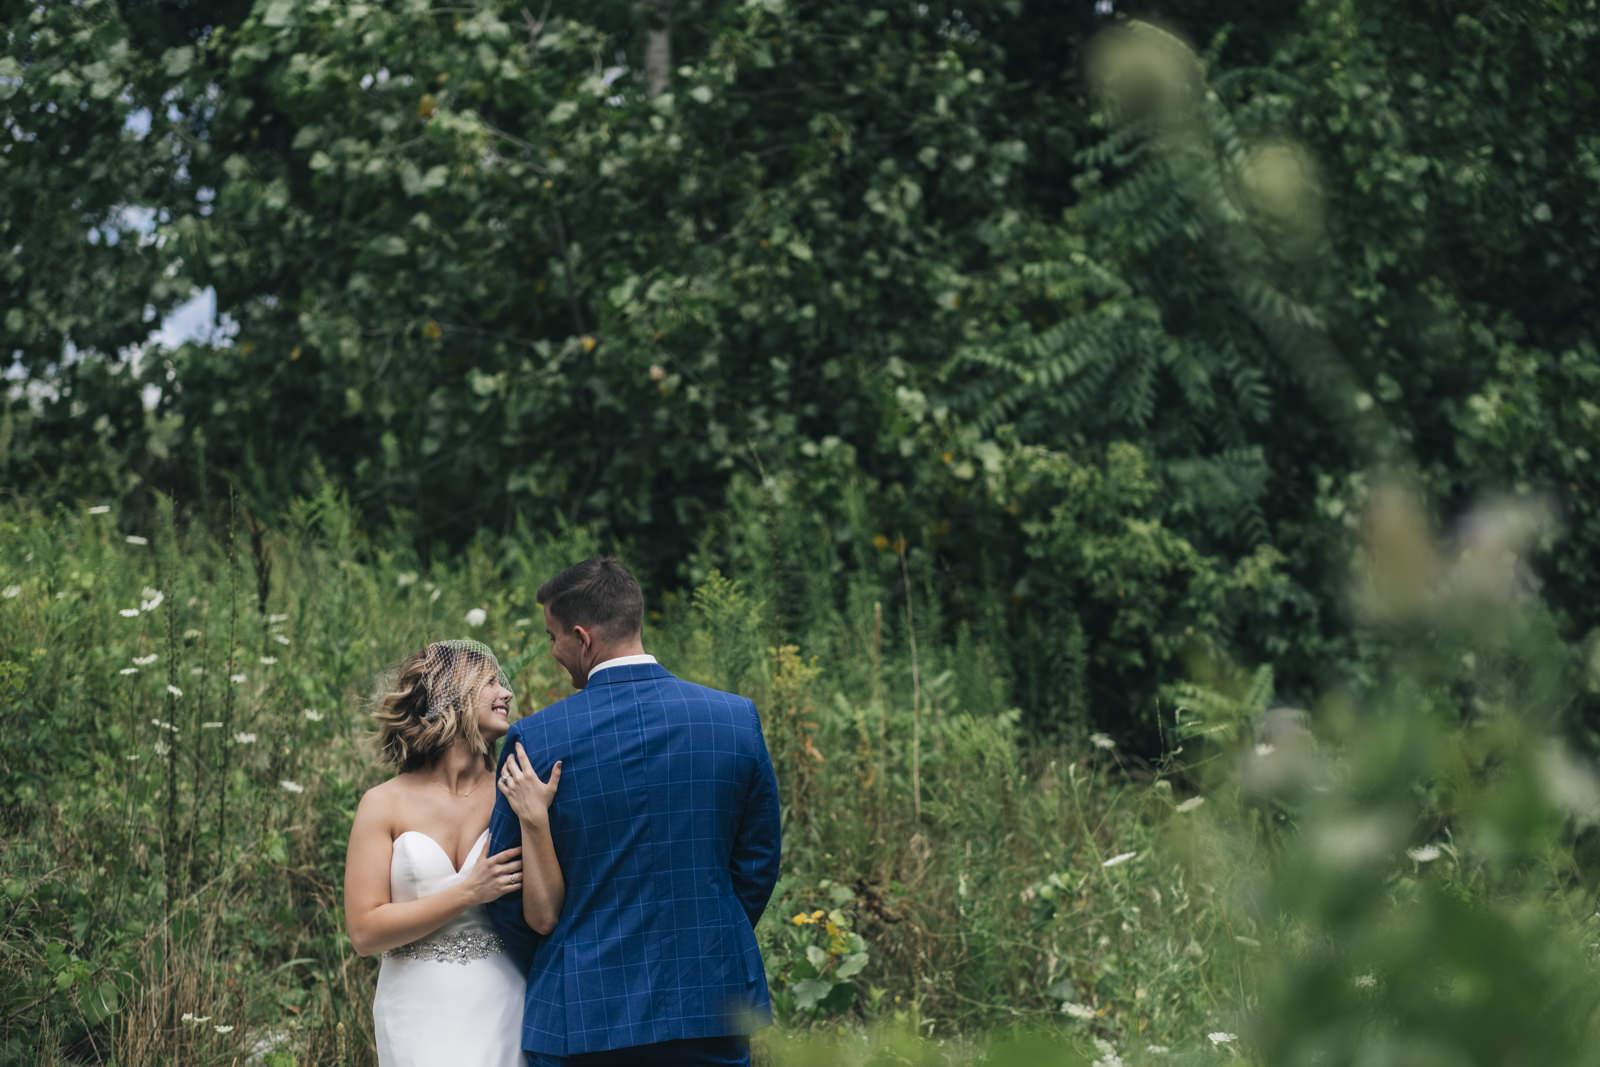 Bride and groom portrait session at Harroun Park in Sylvania, Ohio.